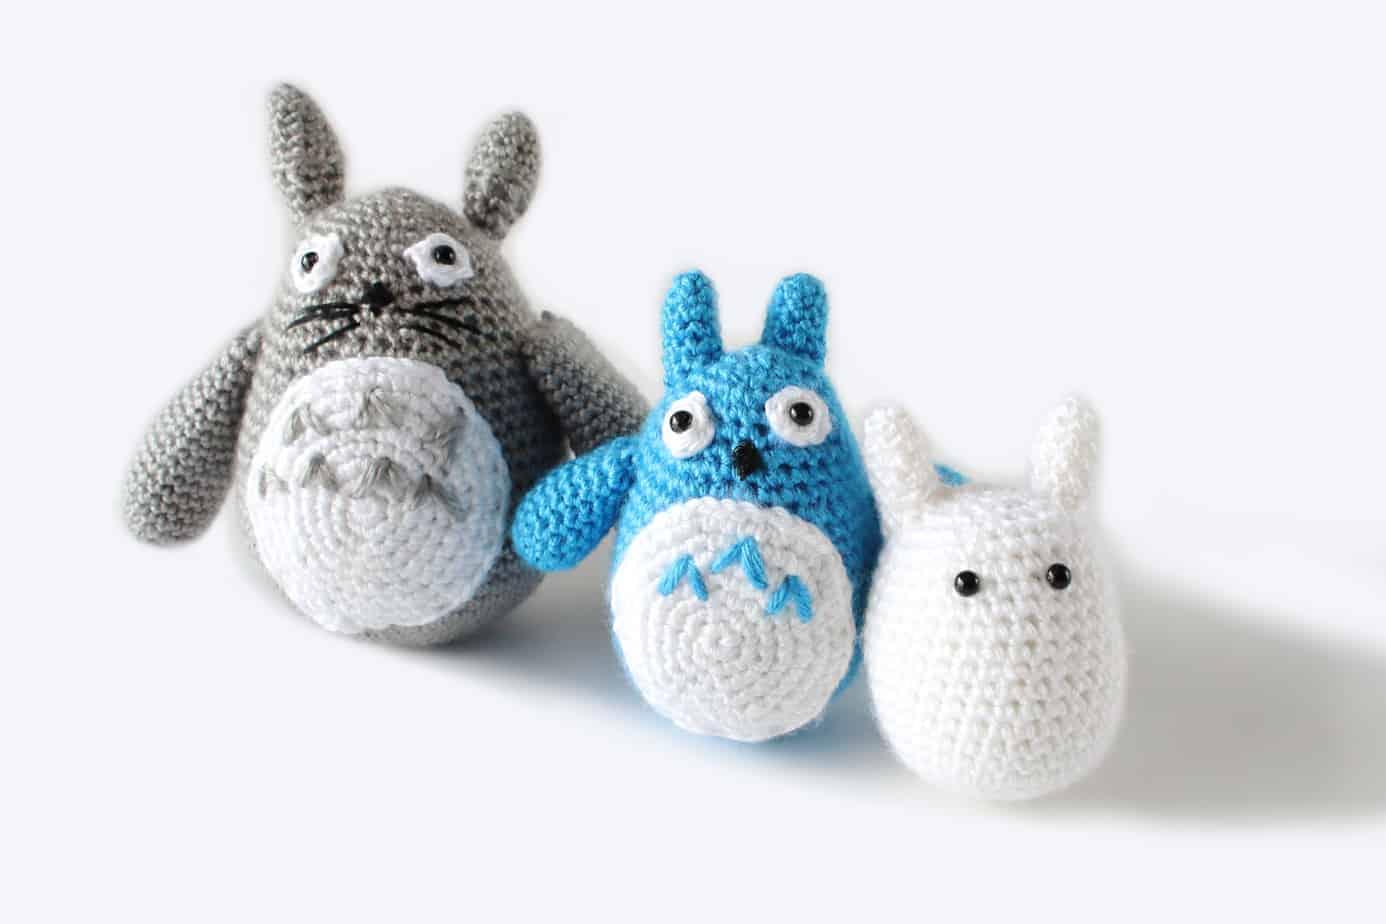 Totoro » 53stitches » Free Amigurumi and Crochet Patterns and ... | 924x1386